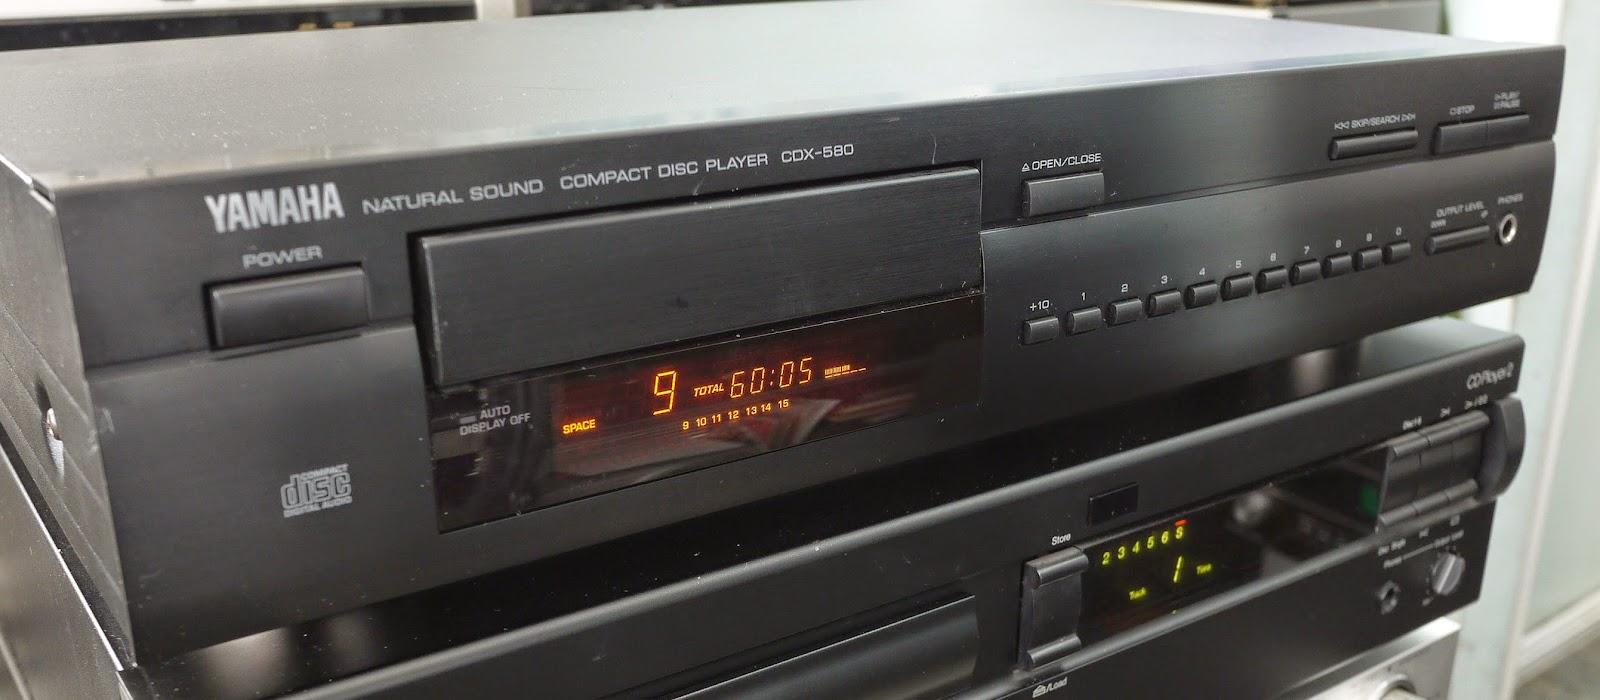 yamaha cdx 580 cd player audiobaza. Black Bedroom Furniture Sets. Home Design Ideas